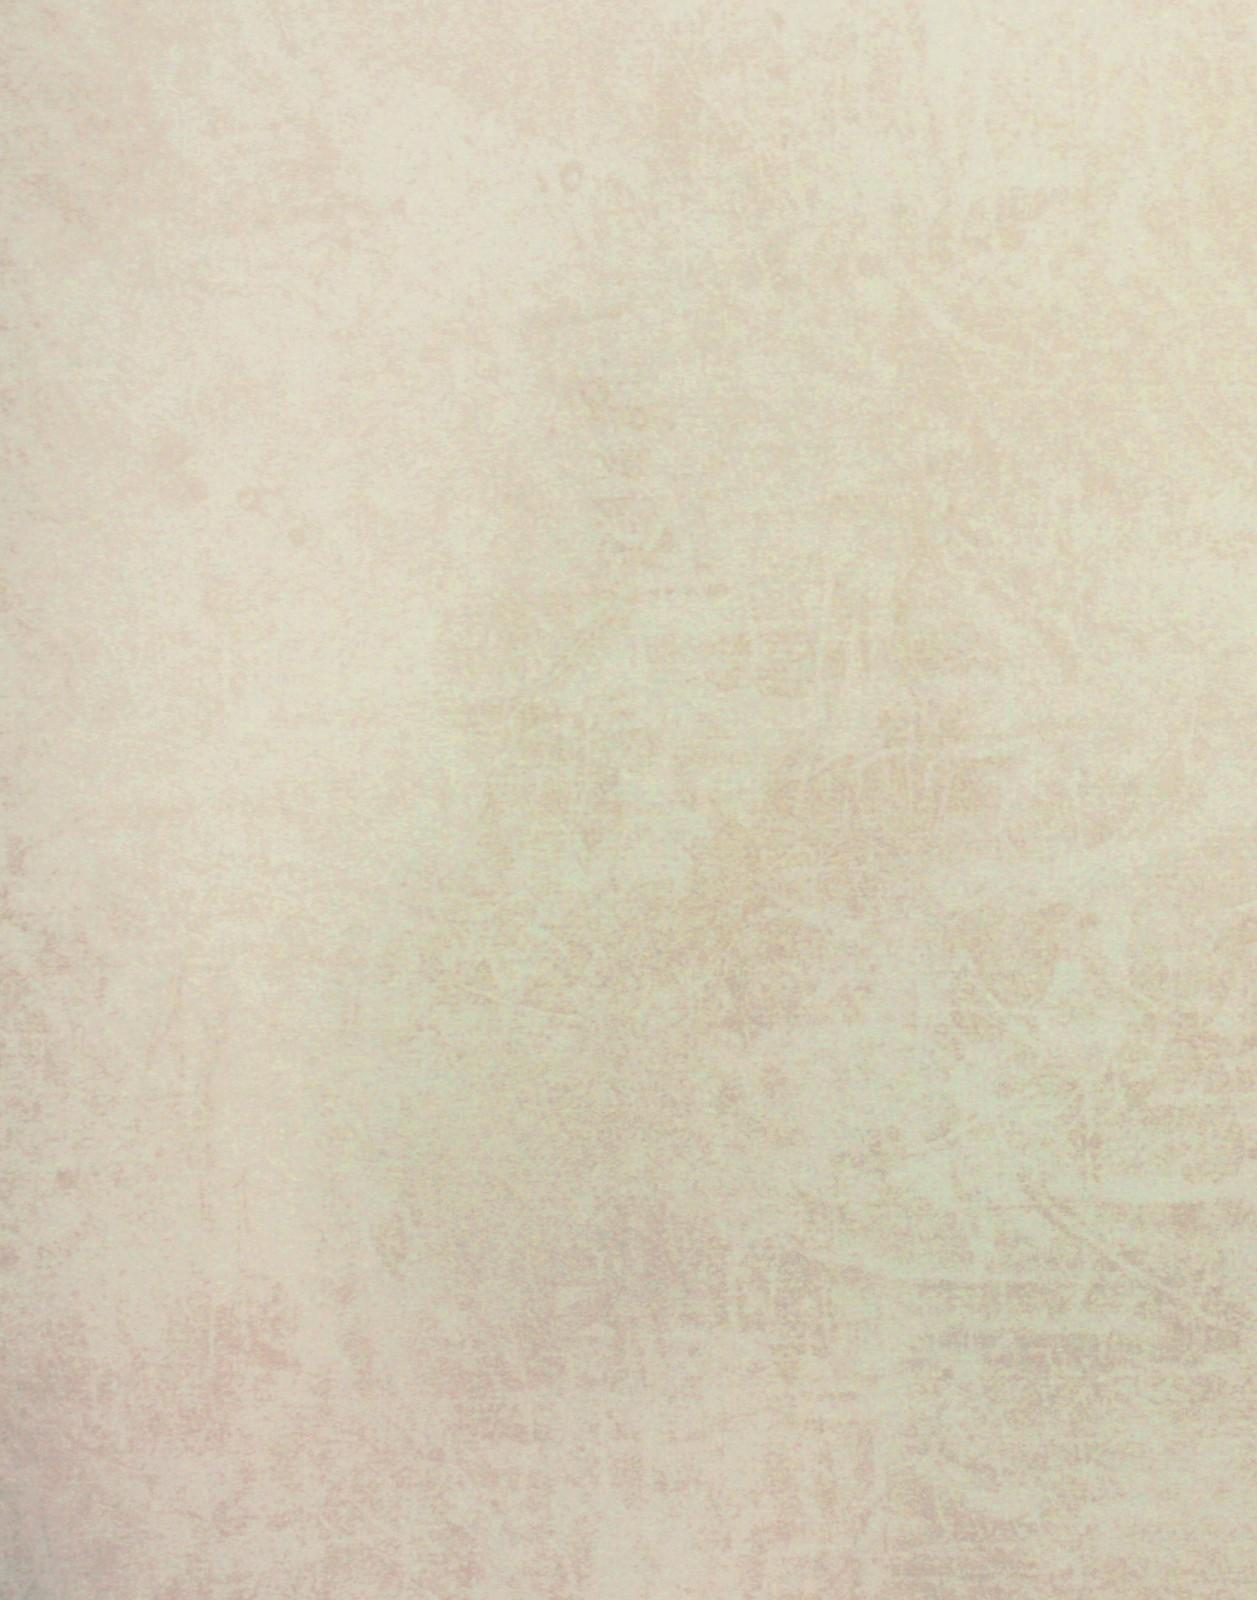 La veneziana vliestapete marburg tapete edel patina beige for Tapete mediterran